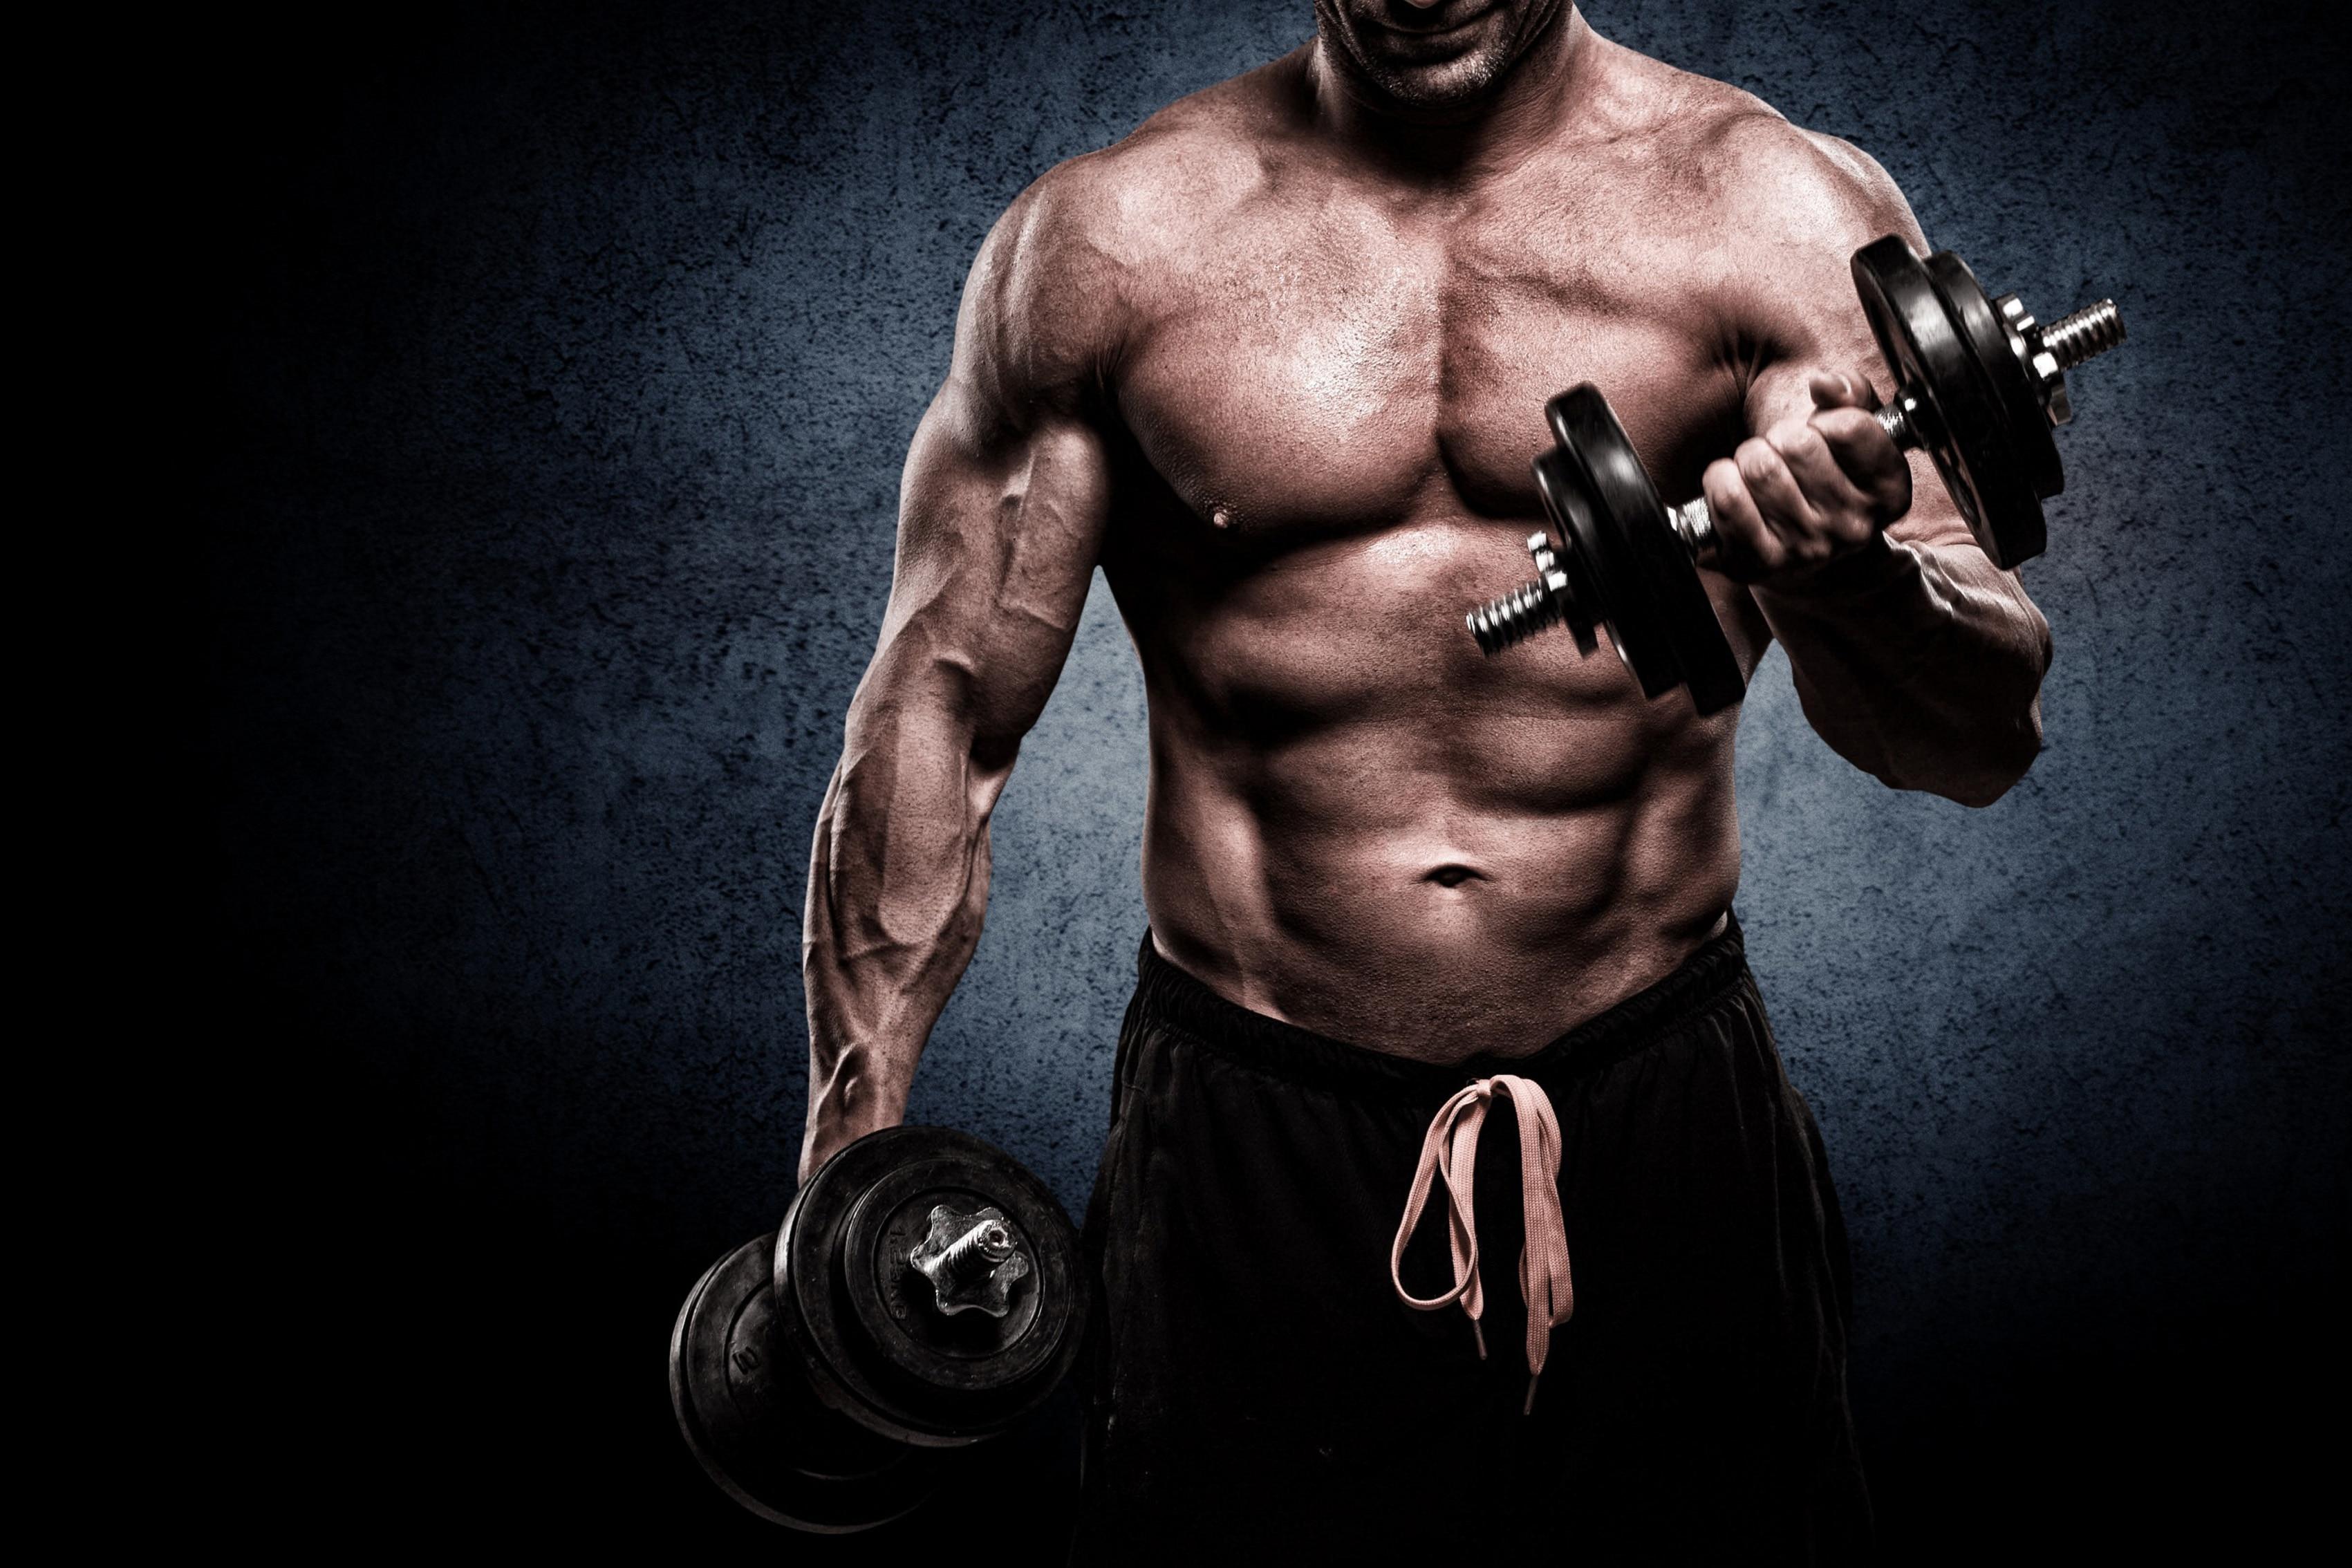 Barbell Gym Muscle Man Bodybuilder Living Room Home Art -4439